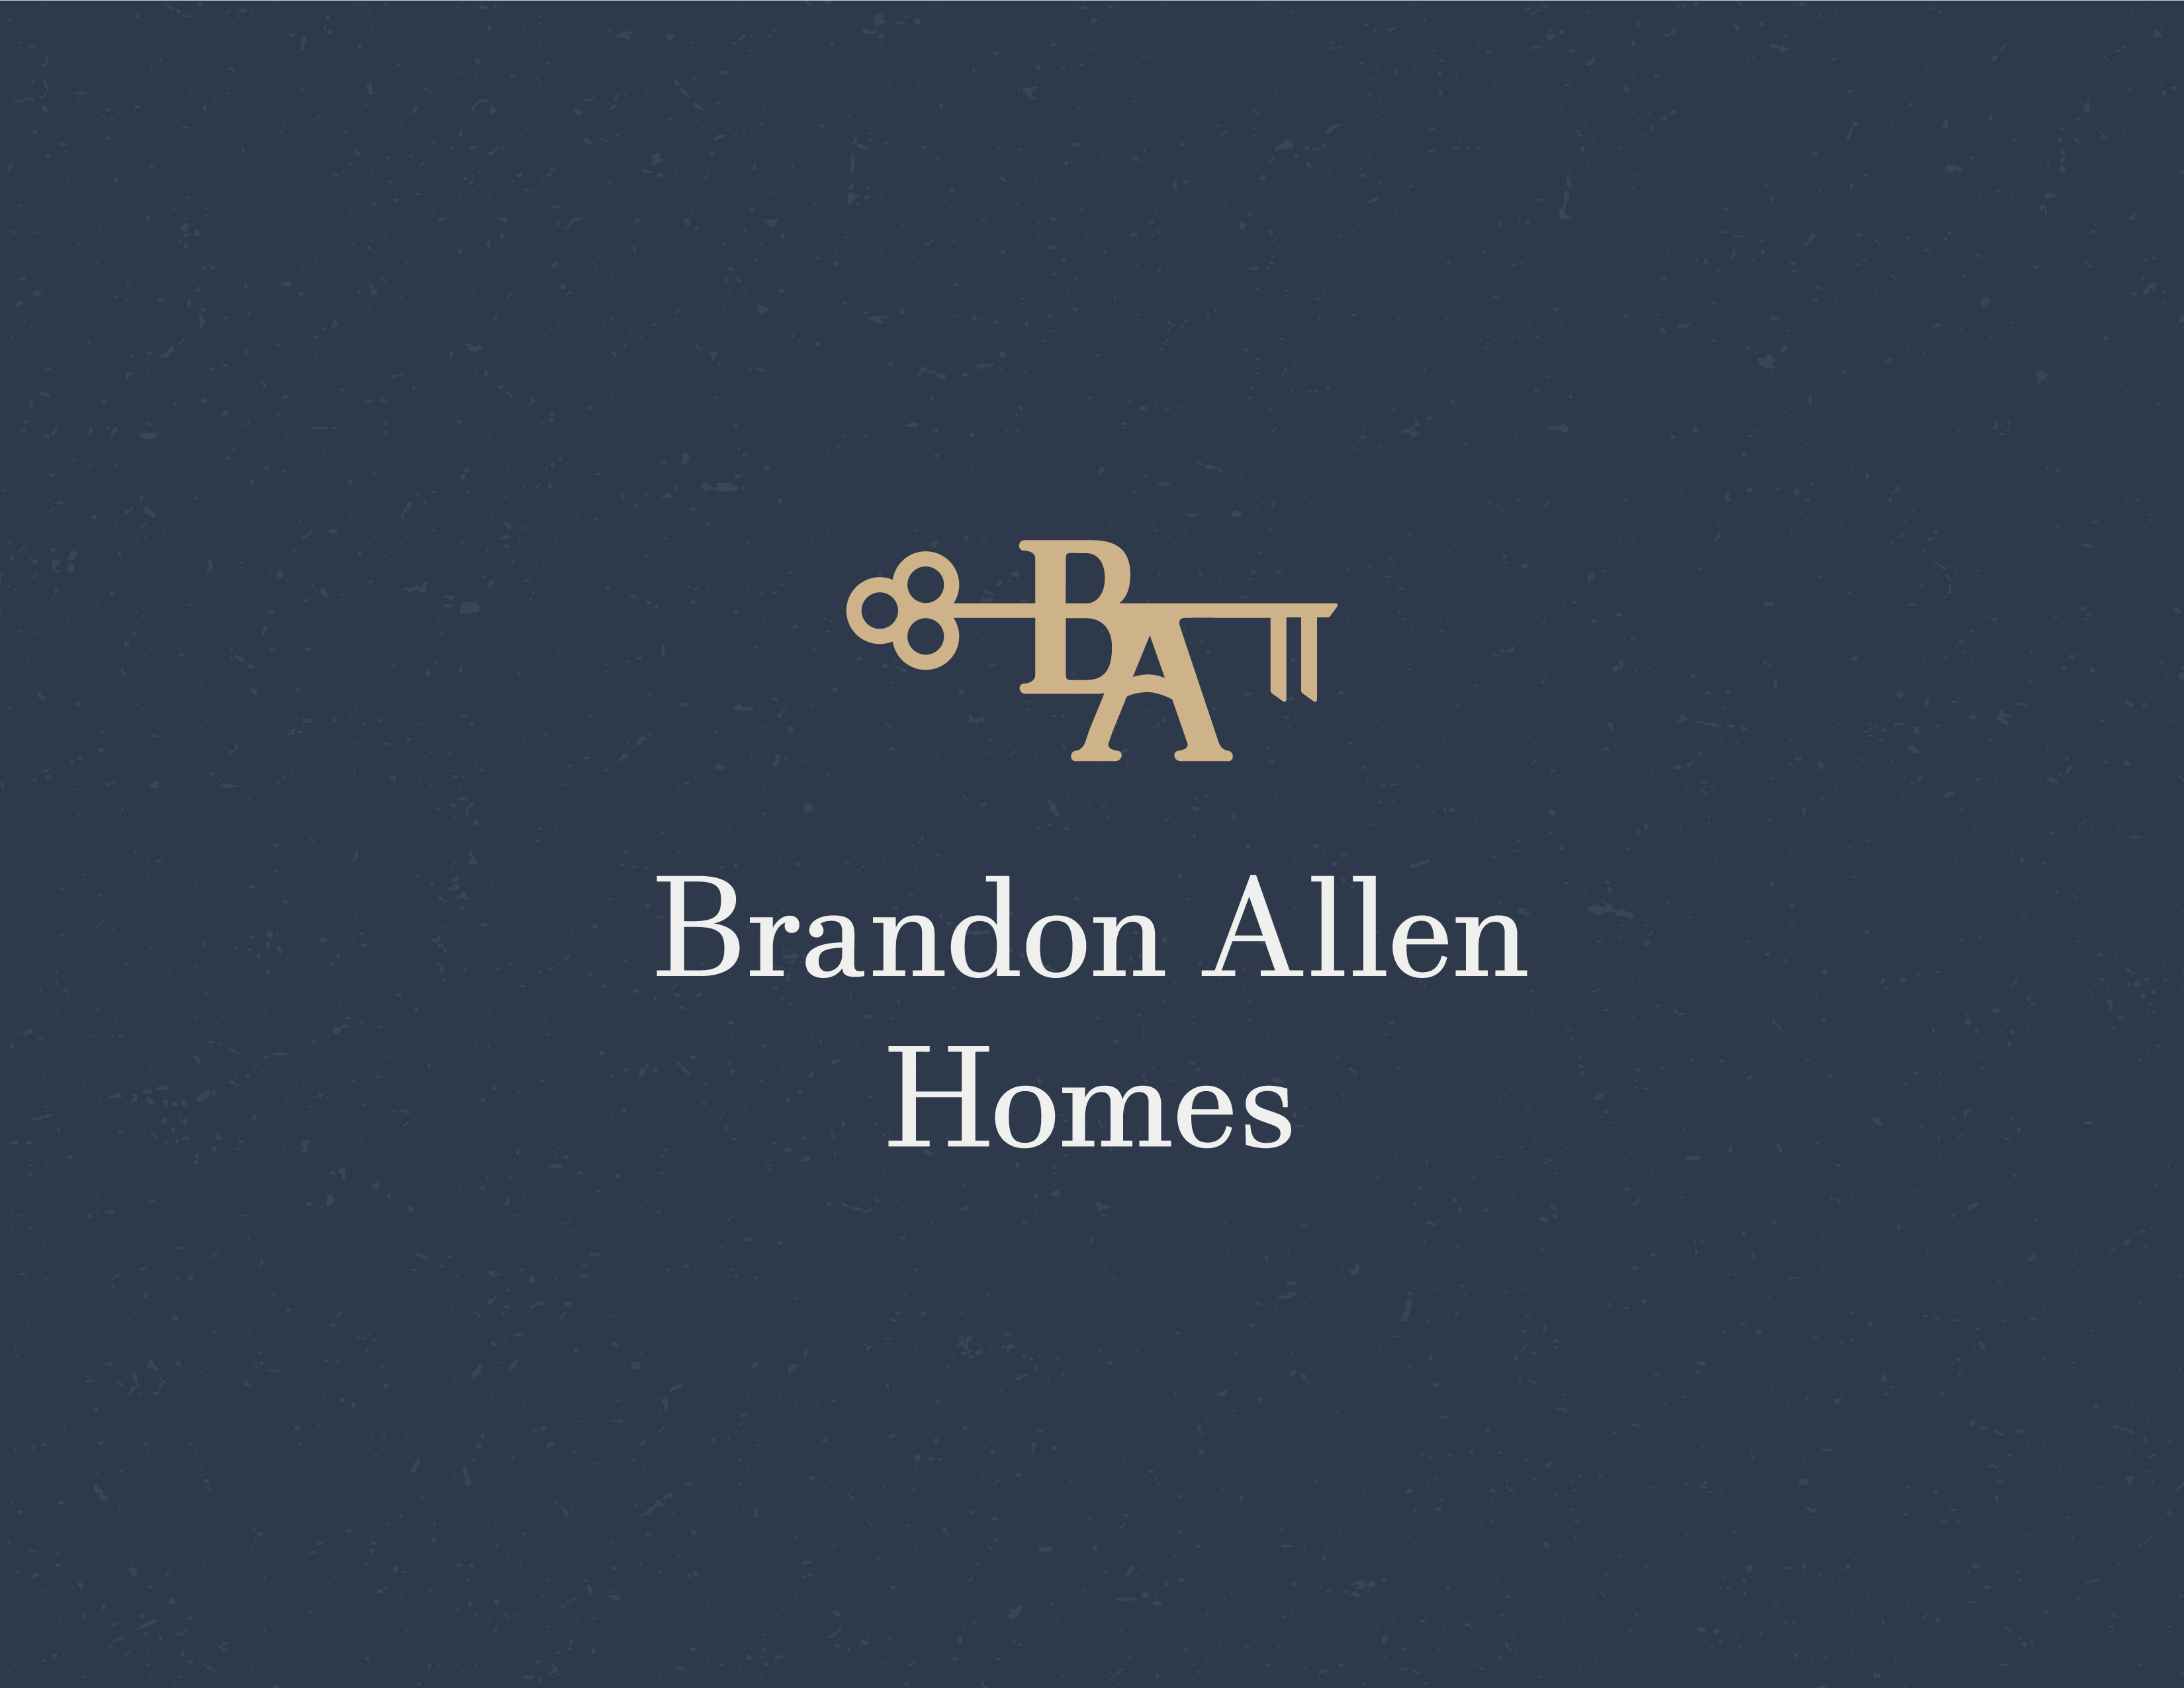 Brandon Allen Homes